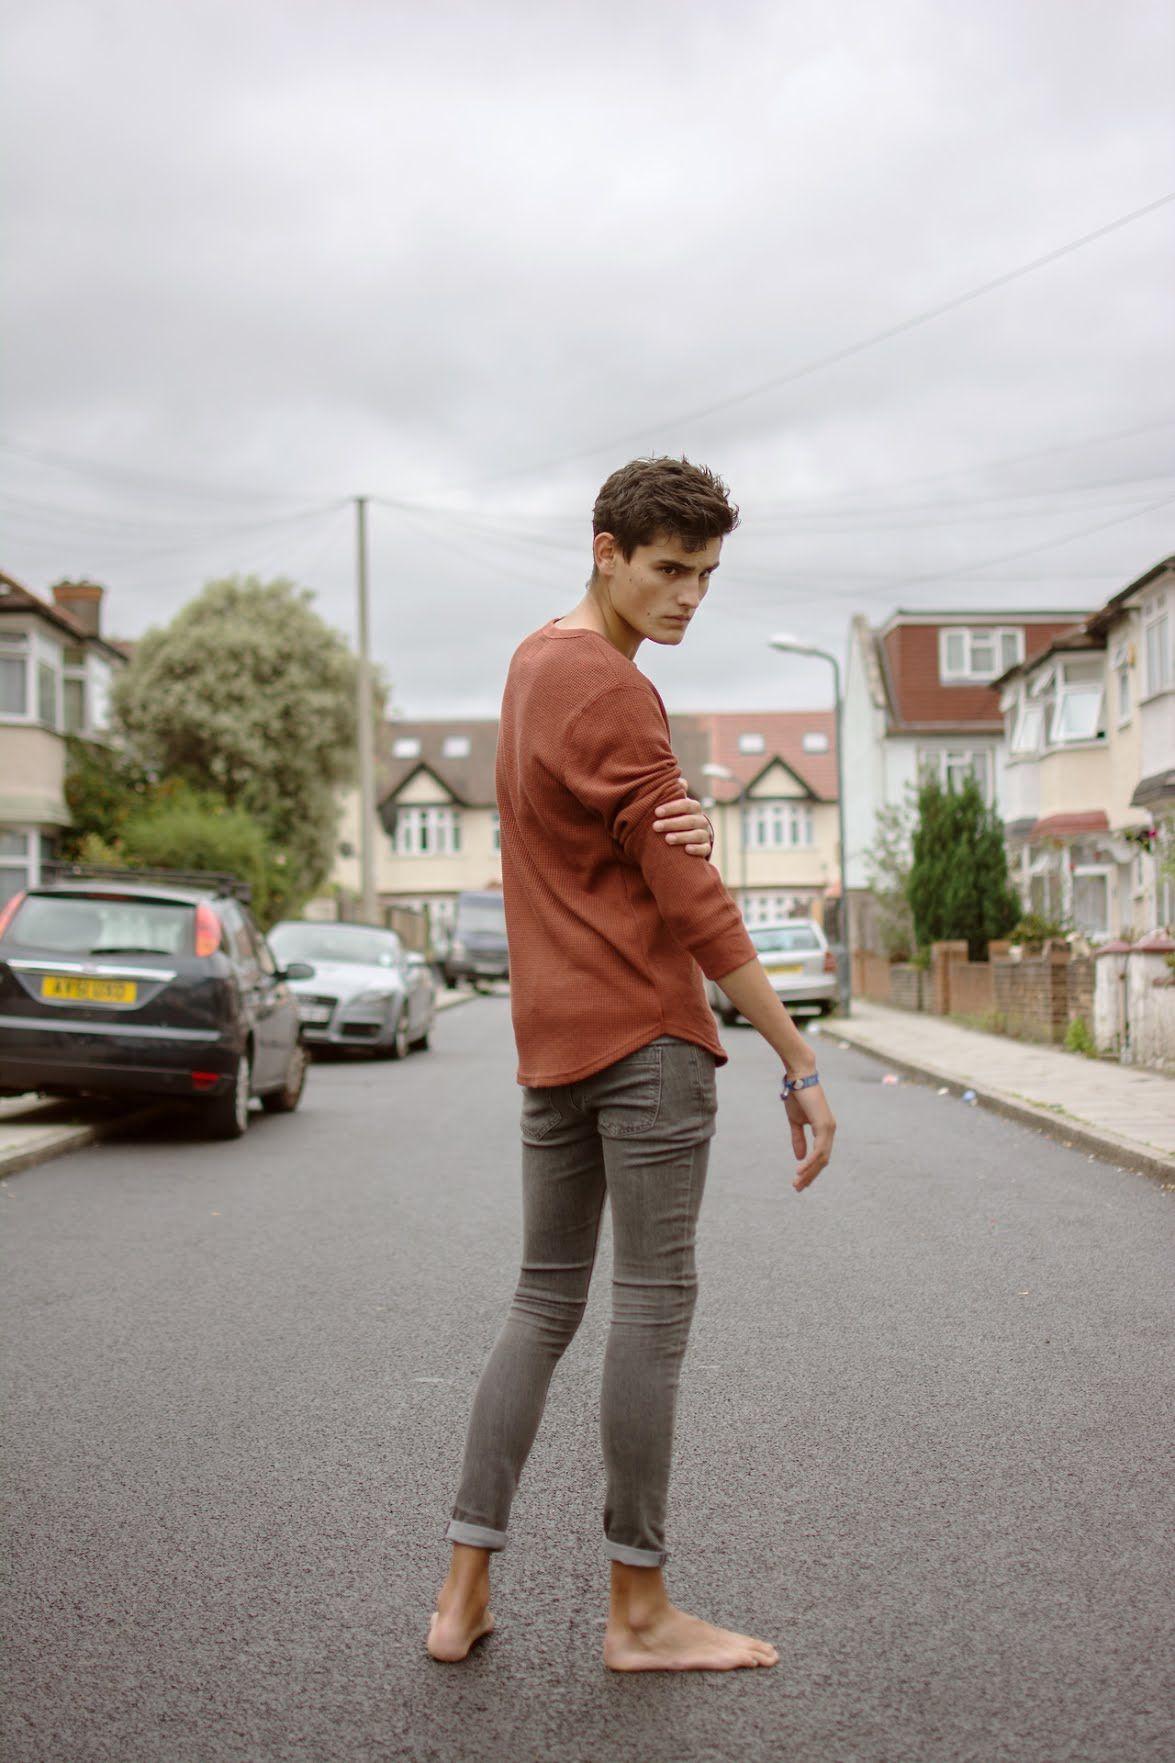 Ivor Legoff — flipflopmoves: Barefoot Style Barefoot in Norfolk... Male  Feet,